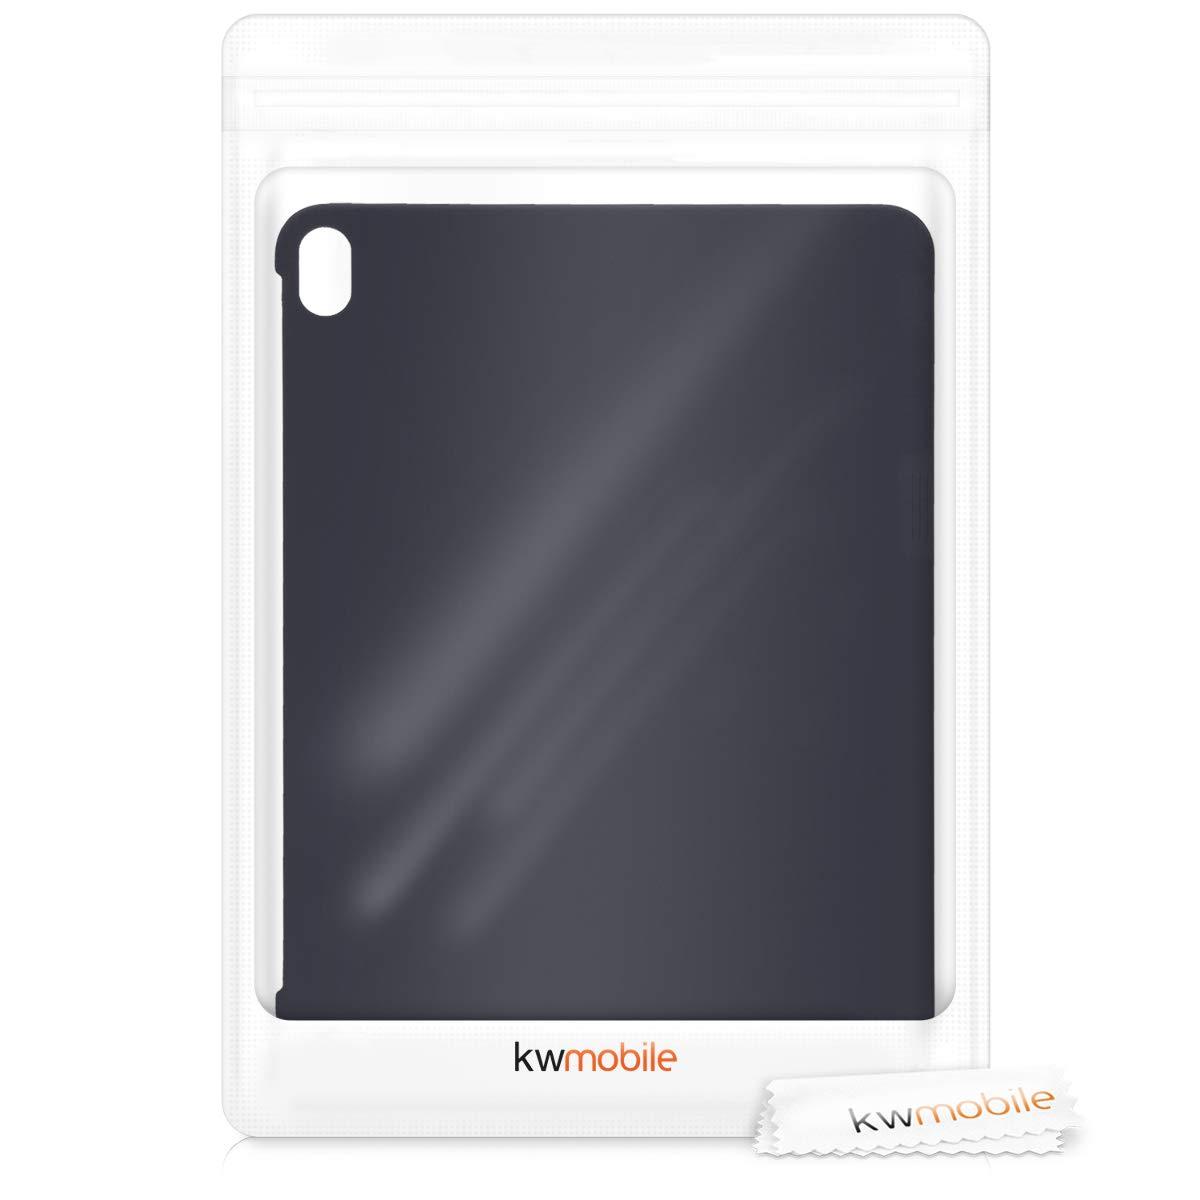 - Carcasa Trasera TPU de kwmobile Funda Inteligente para Apple iPad Pro 11 2018 Transparente para Tablet en